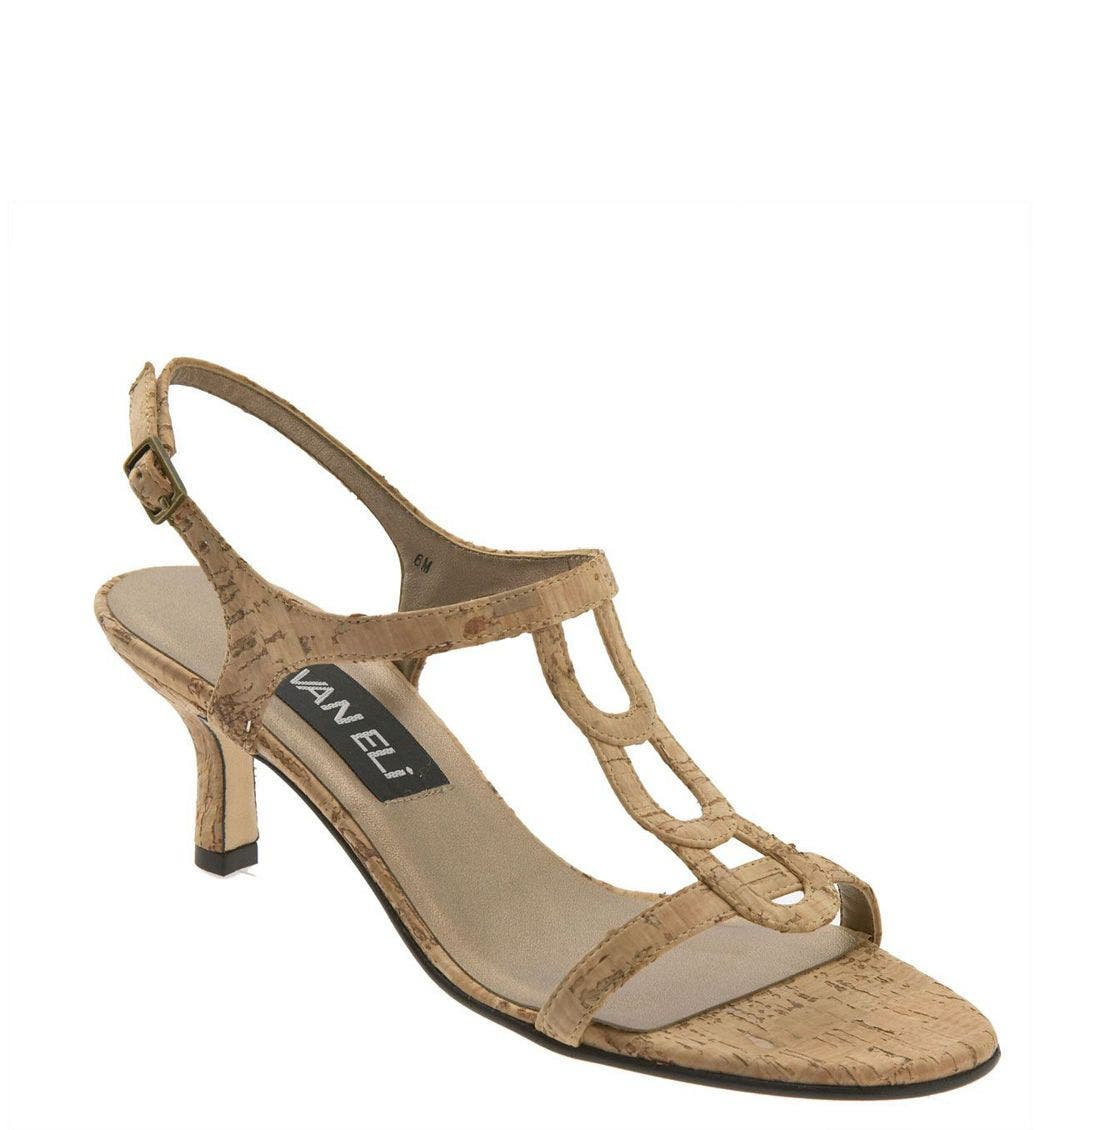 Main Image - VANELi 'Mirelys' Cork Sandal